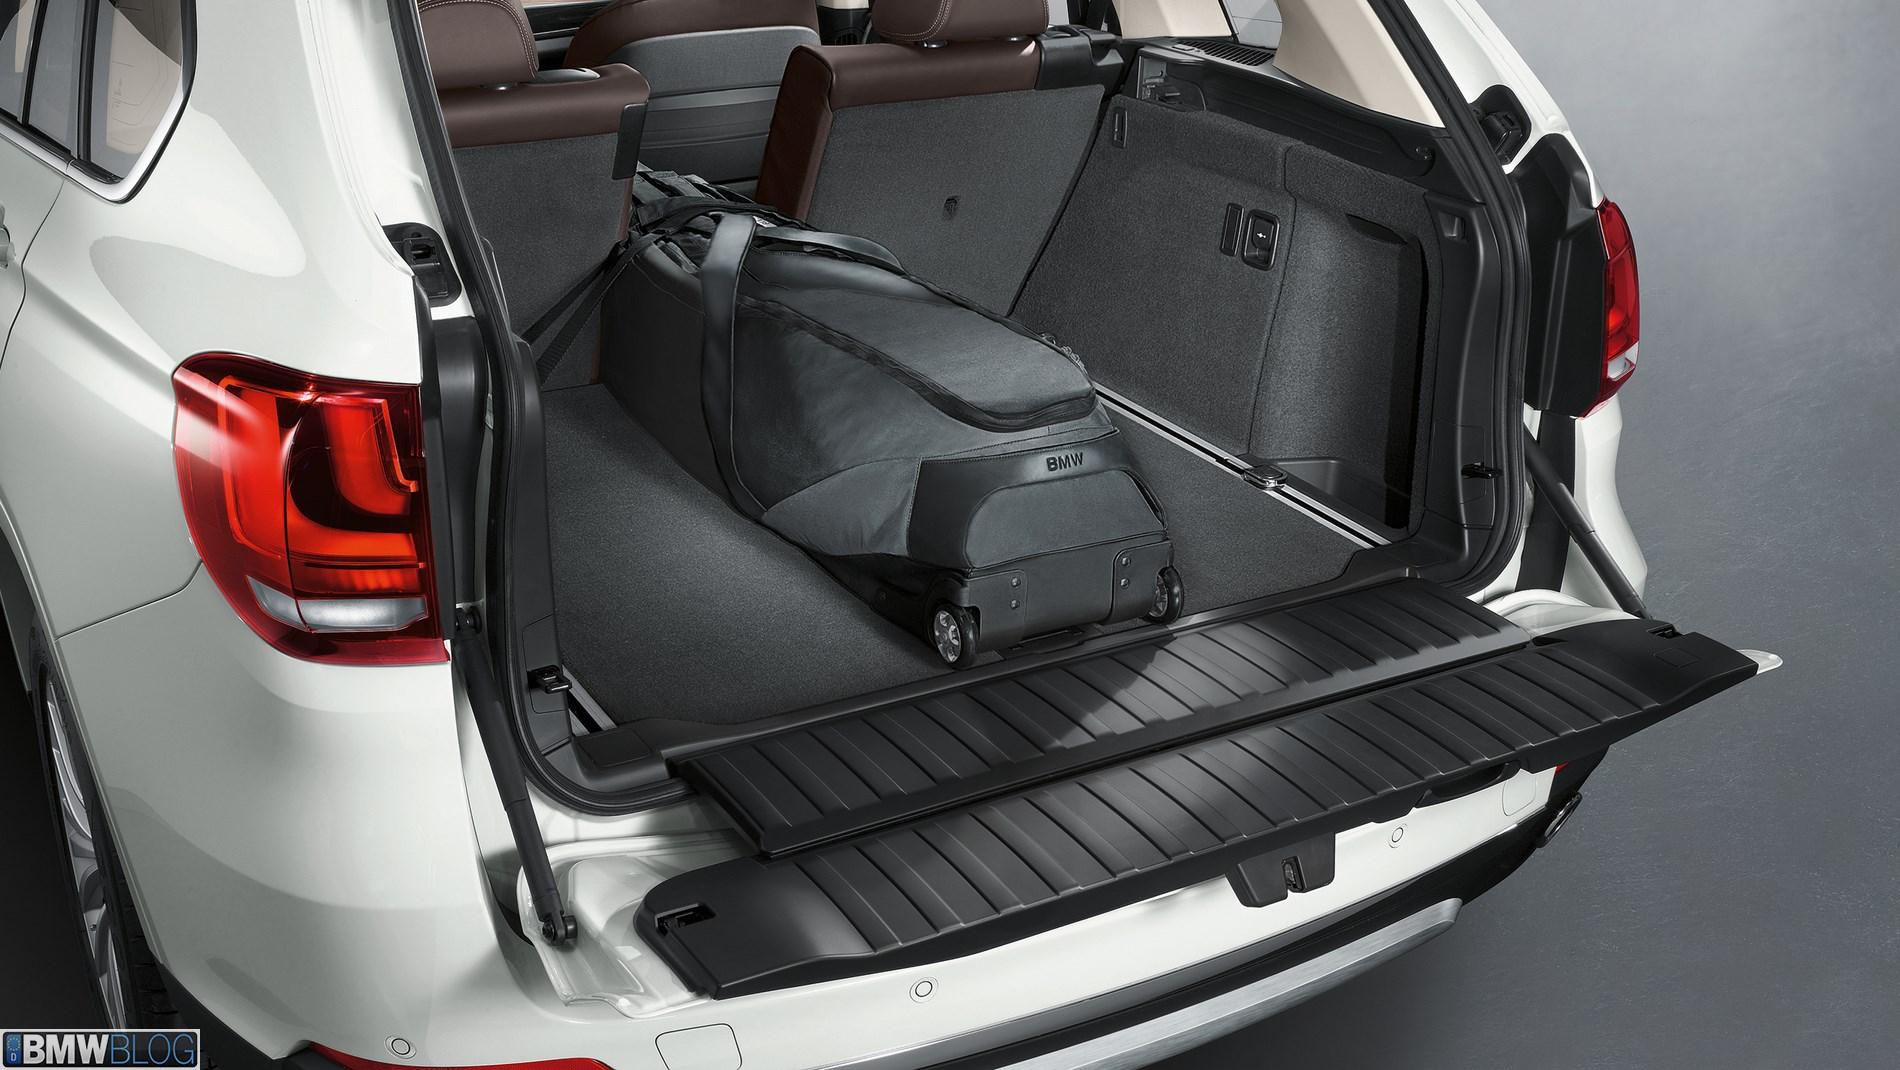 Original BMW Accessories For New BMW X5